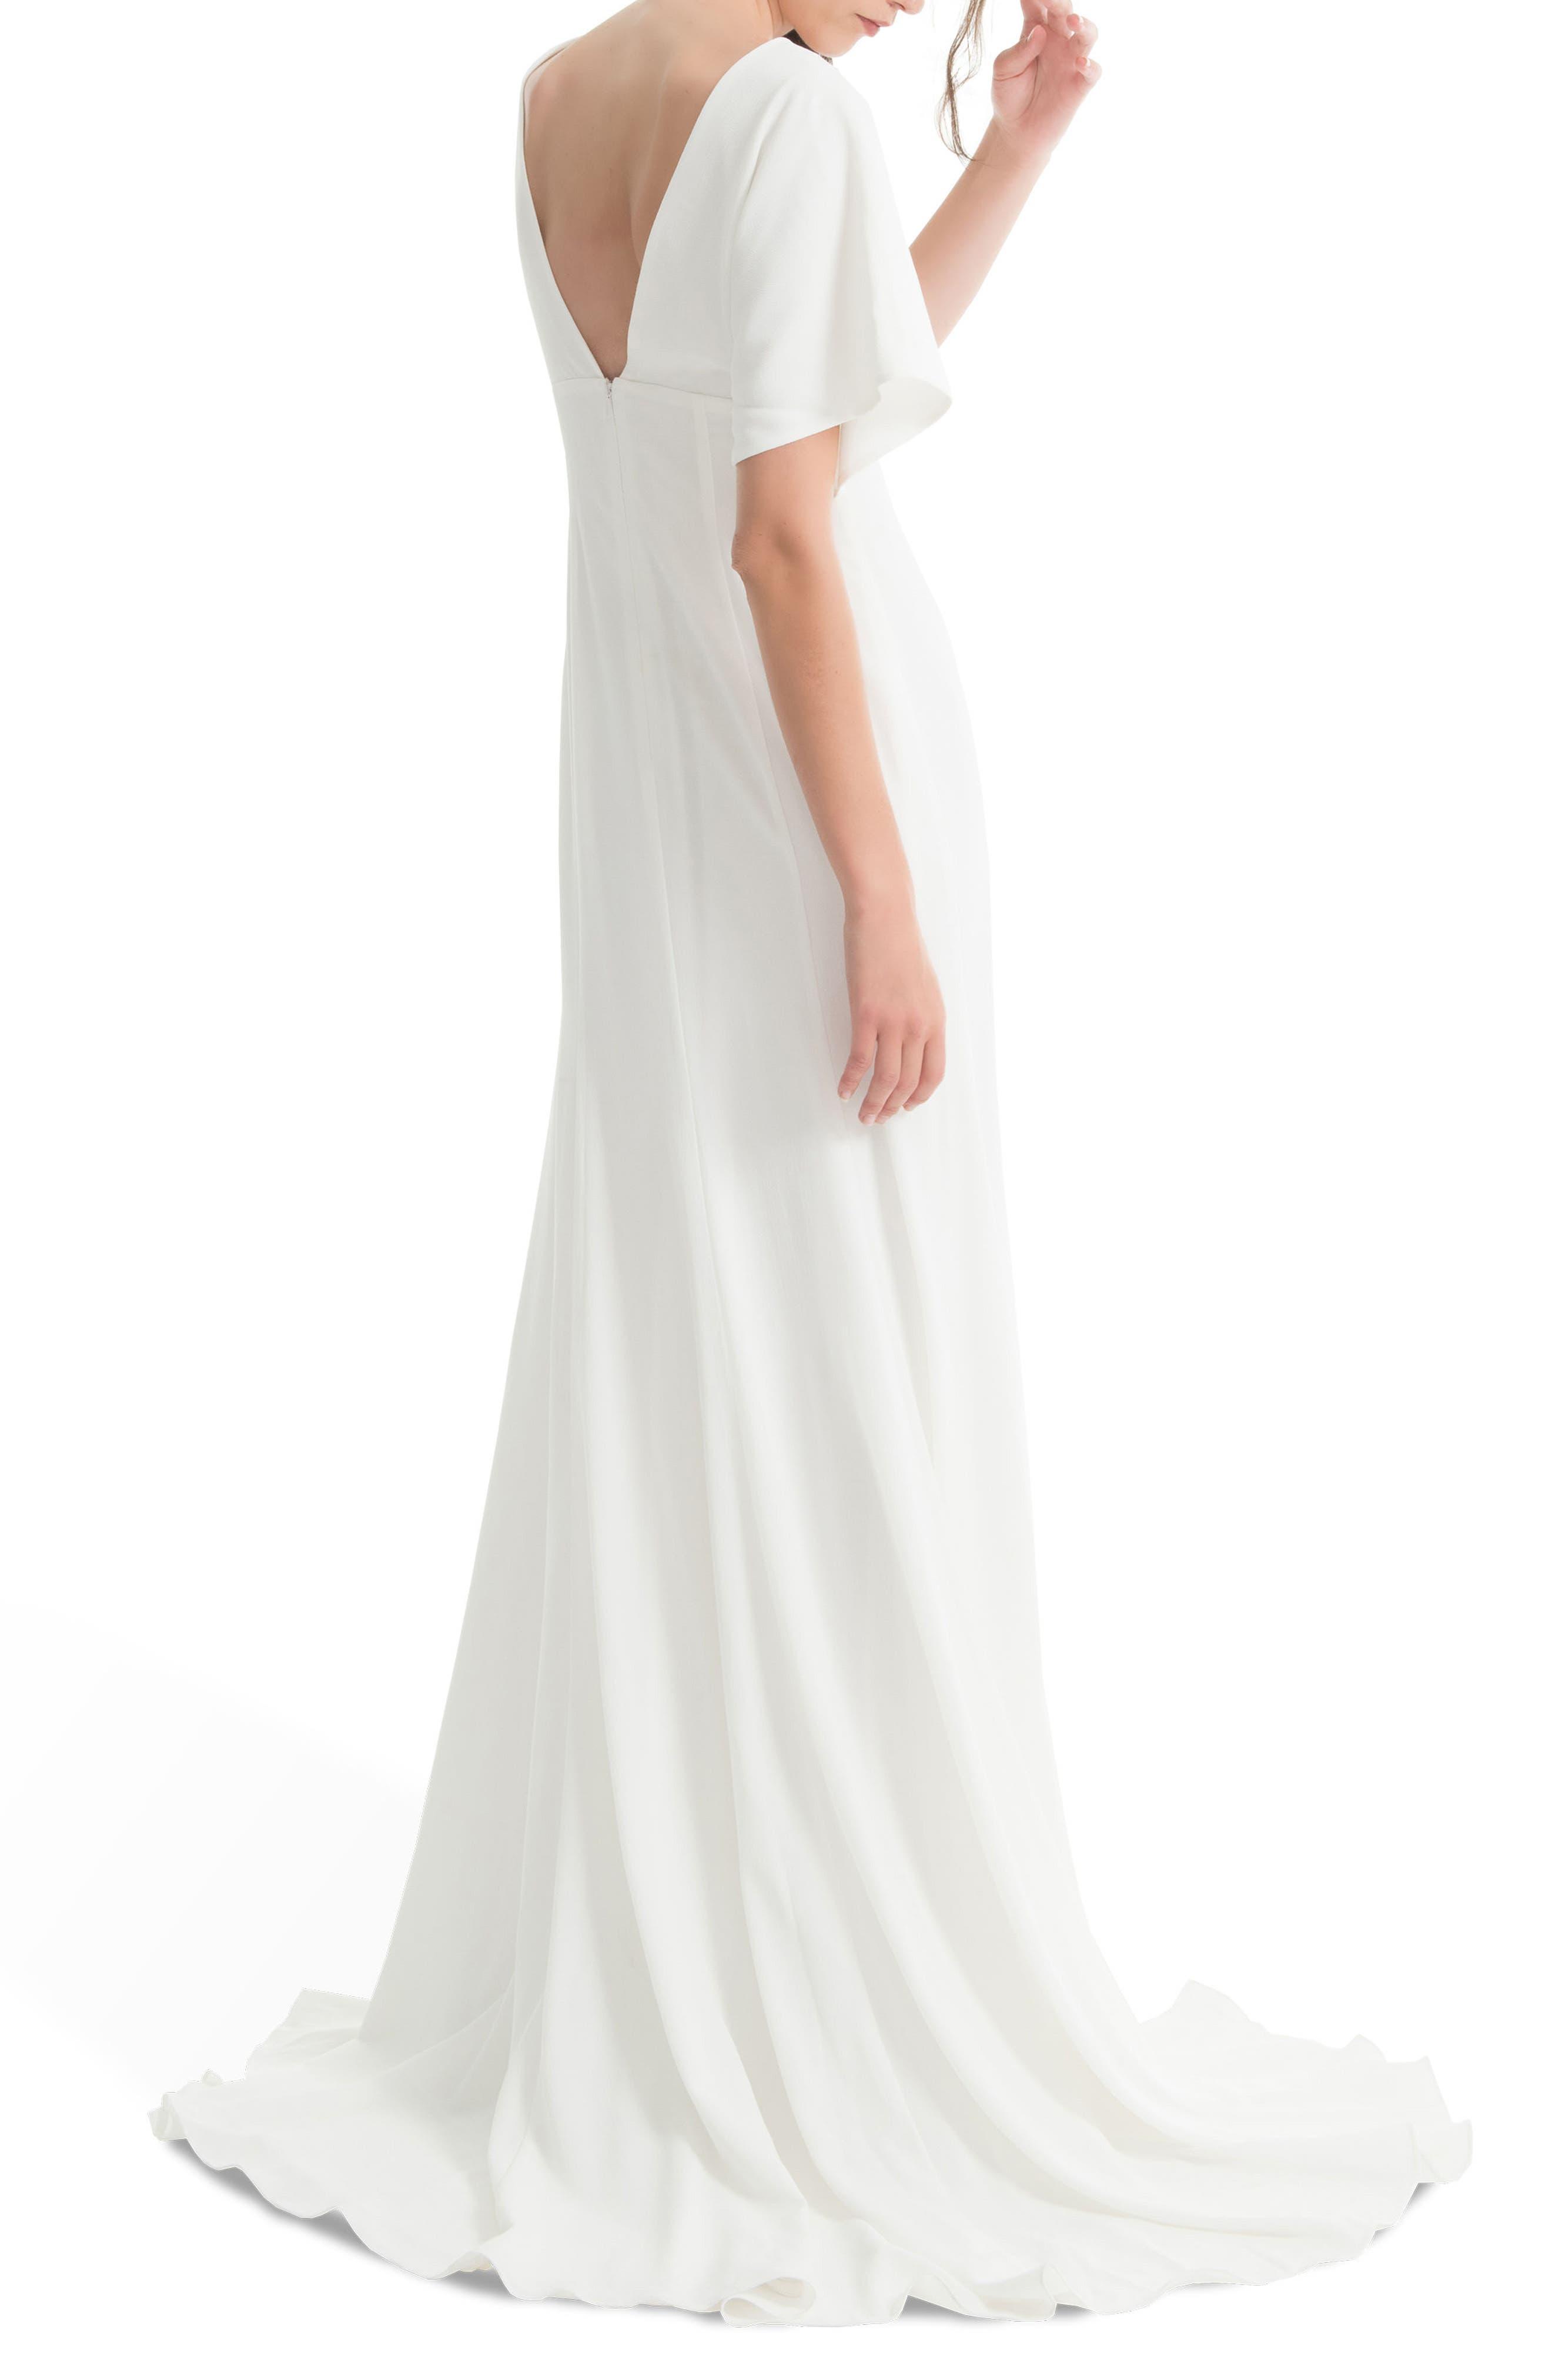 JOANNA AUGUST, Pattie Empire Waist Crepe Gown, Alternate thumbnail 2, color, WHITE